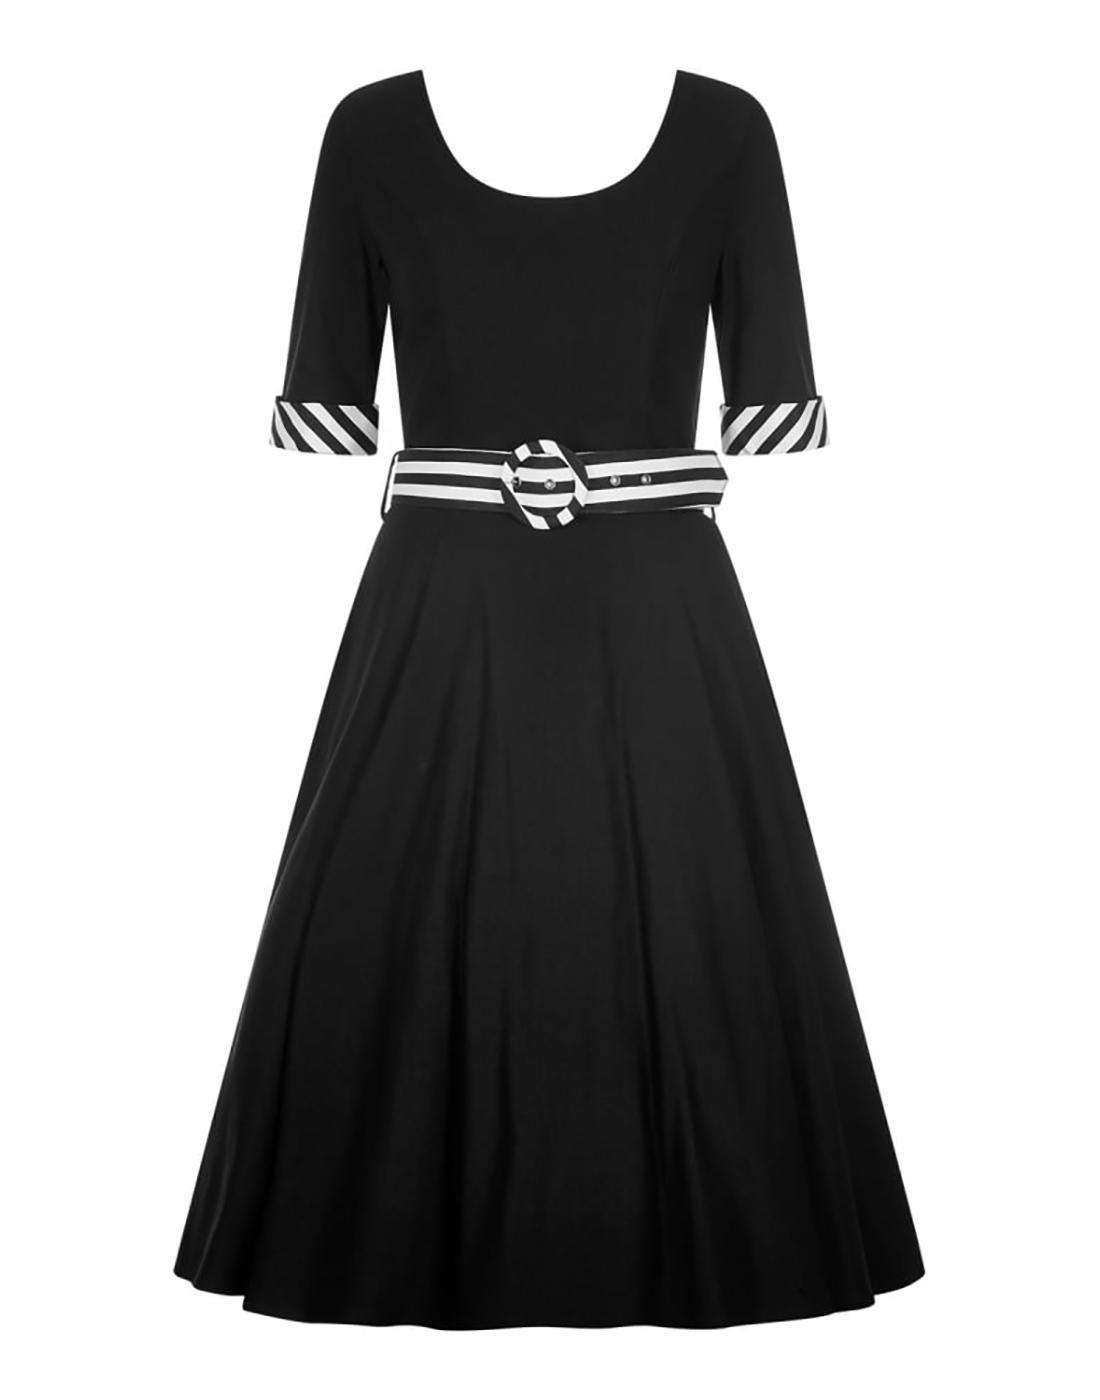 June COLLECTIF Retro 50s Vintage Doll Dress Black